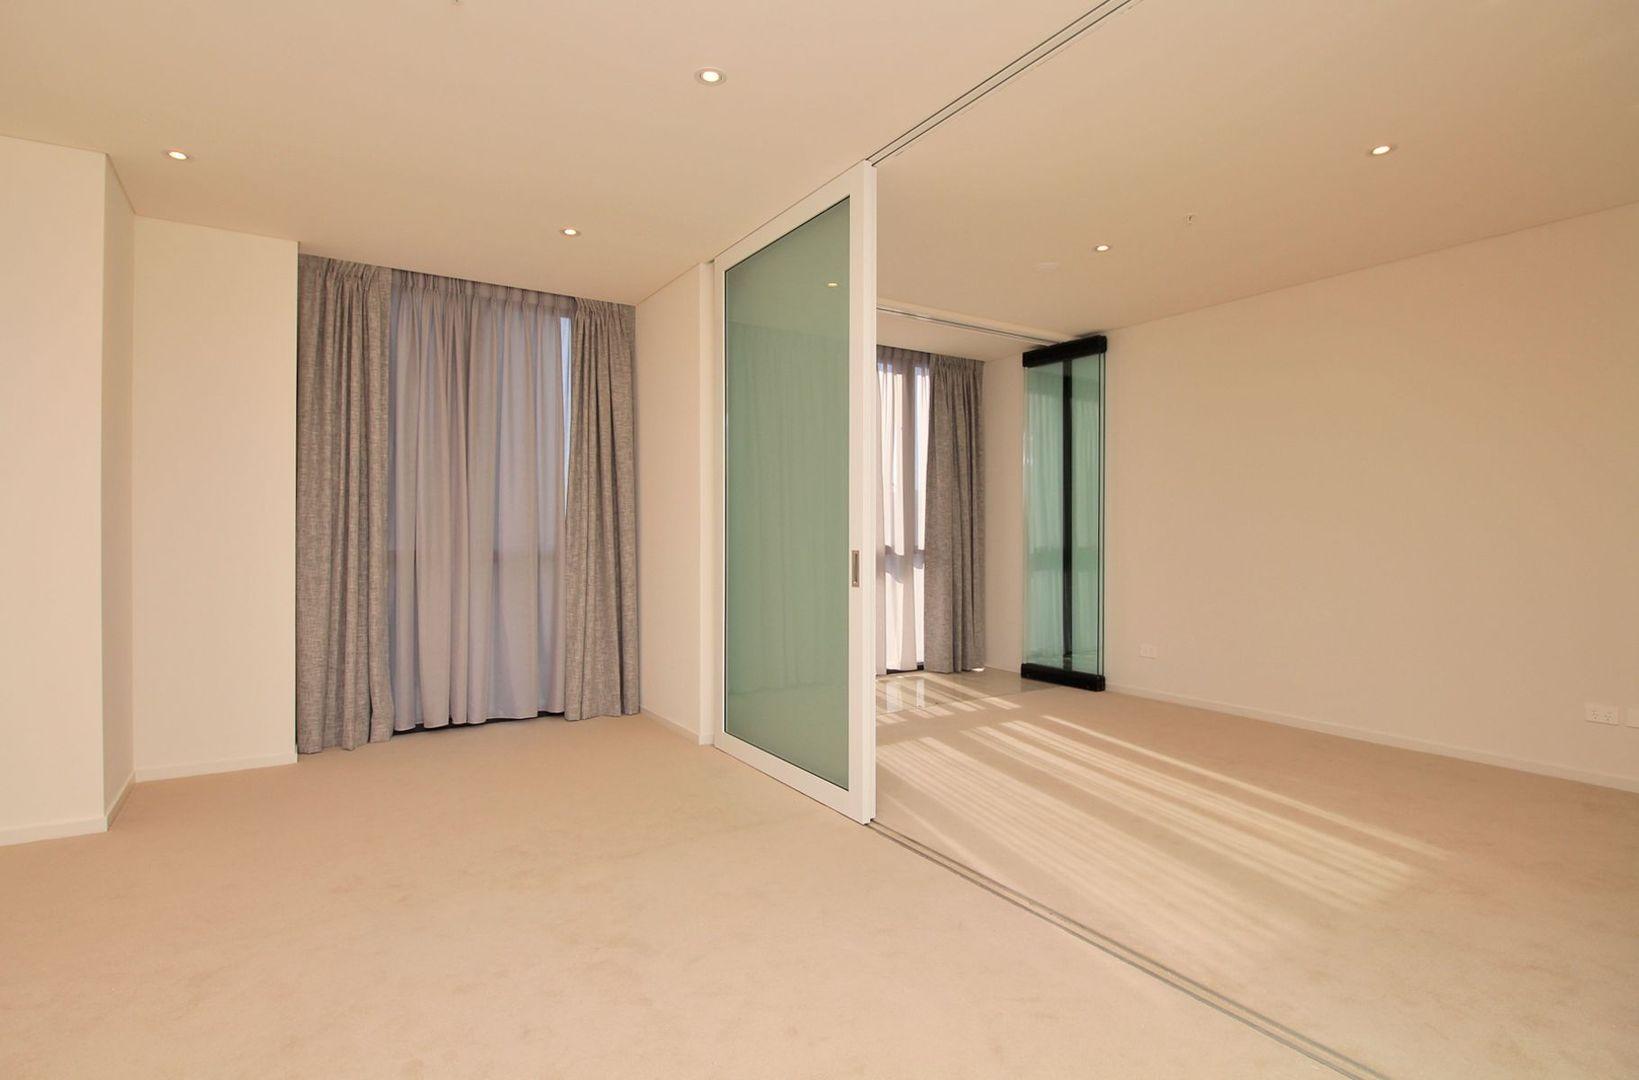 1225/45 Macquarie Street, Parramatta NSW 2150, Image 1